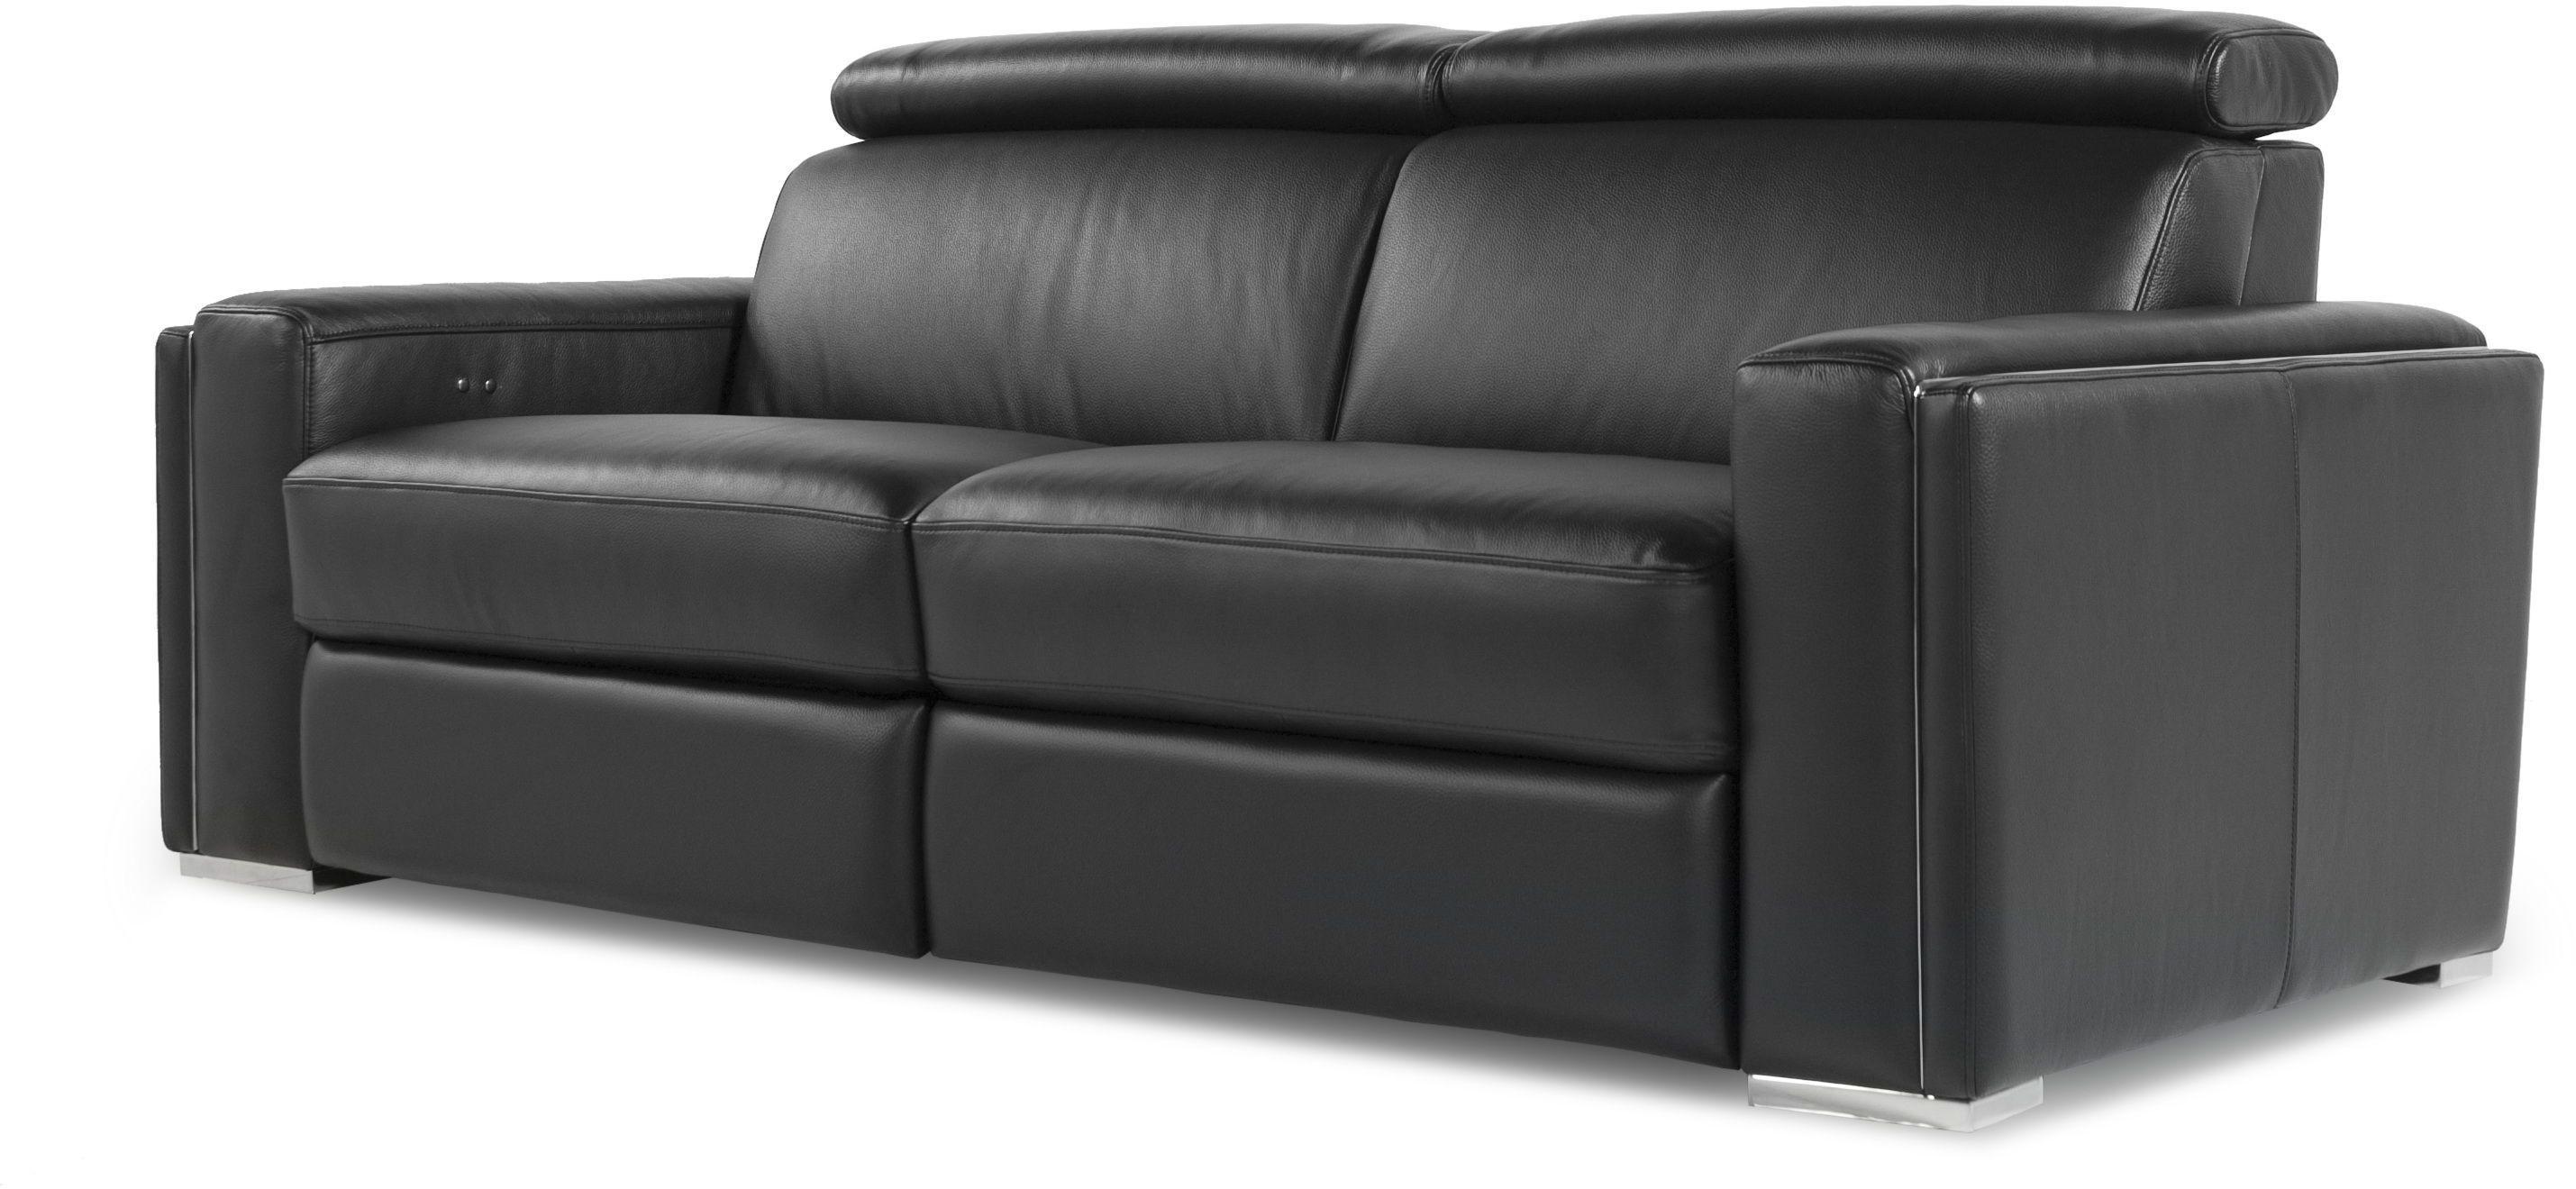 Ellie Black Top Grain Leather Reclining Sofa 53137b1184 Moroni